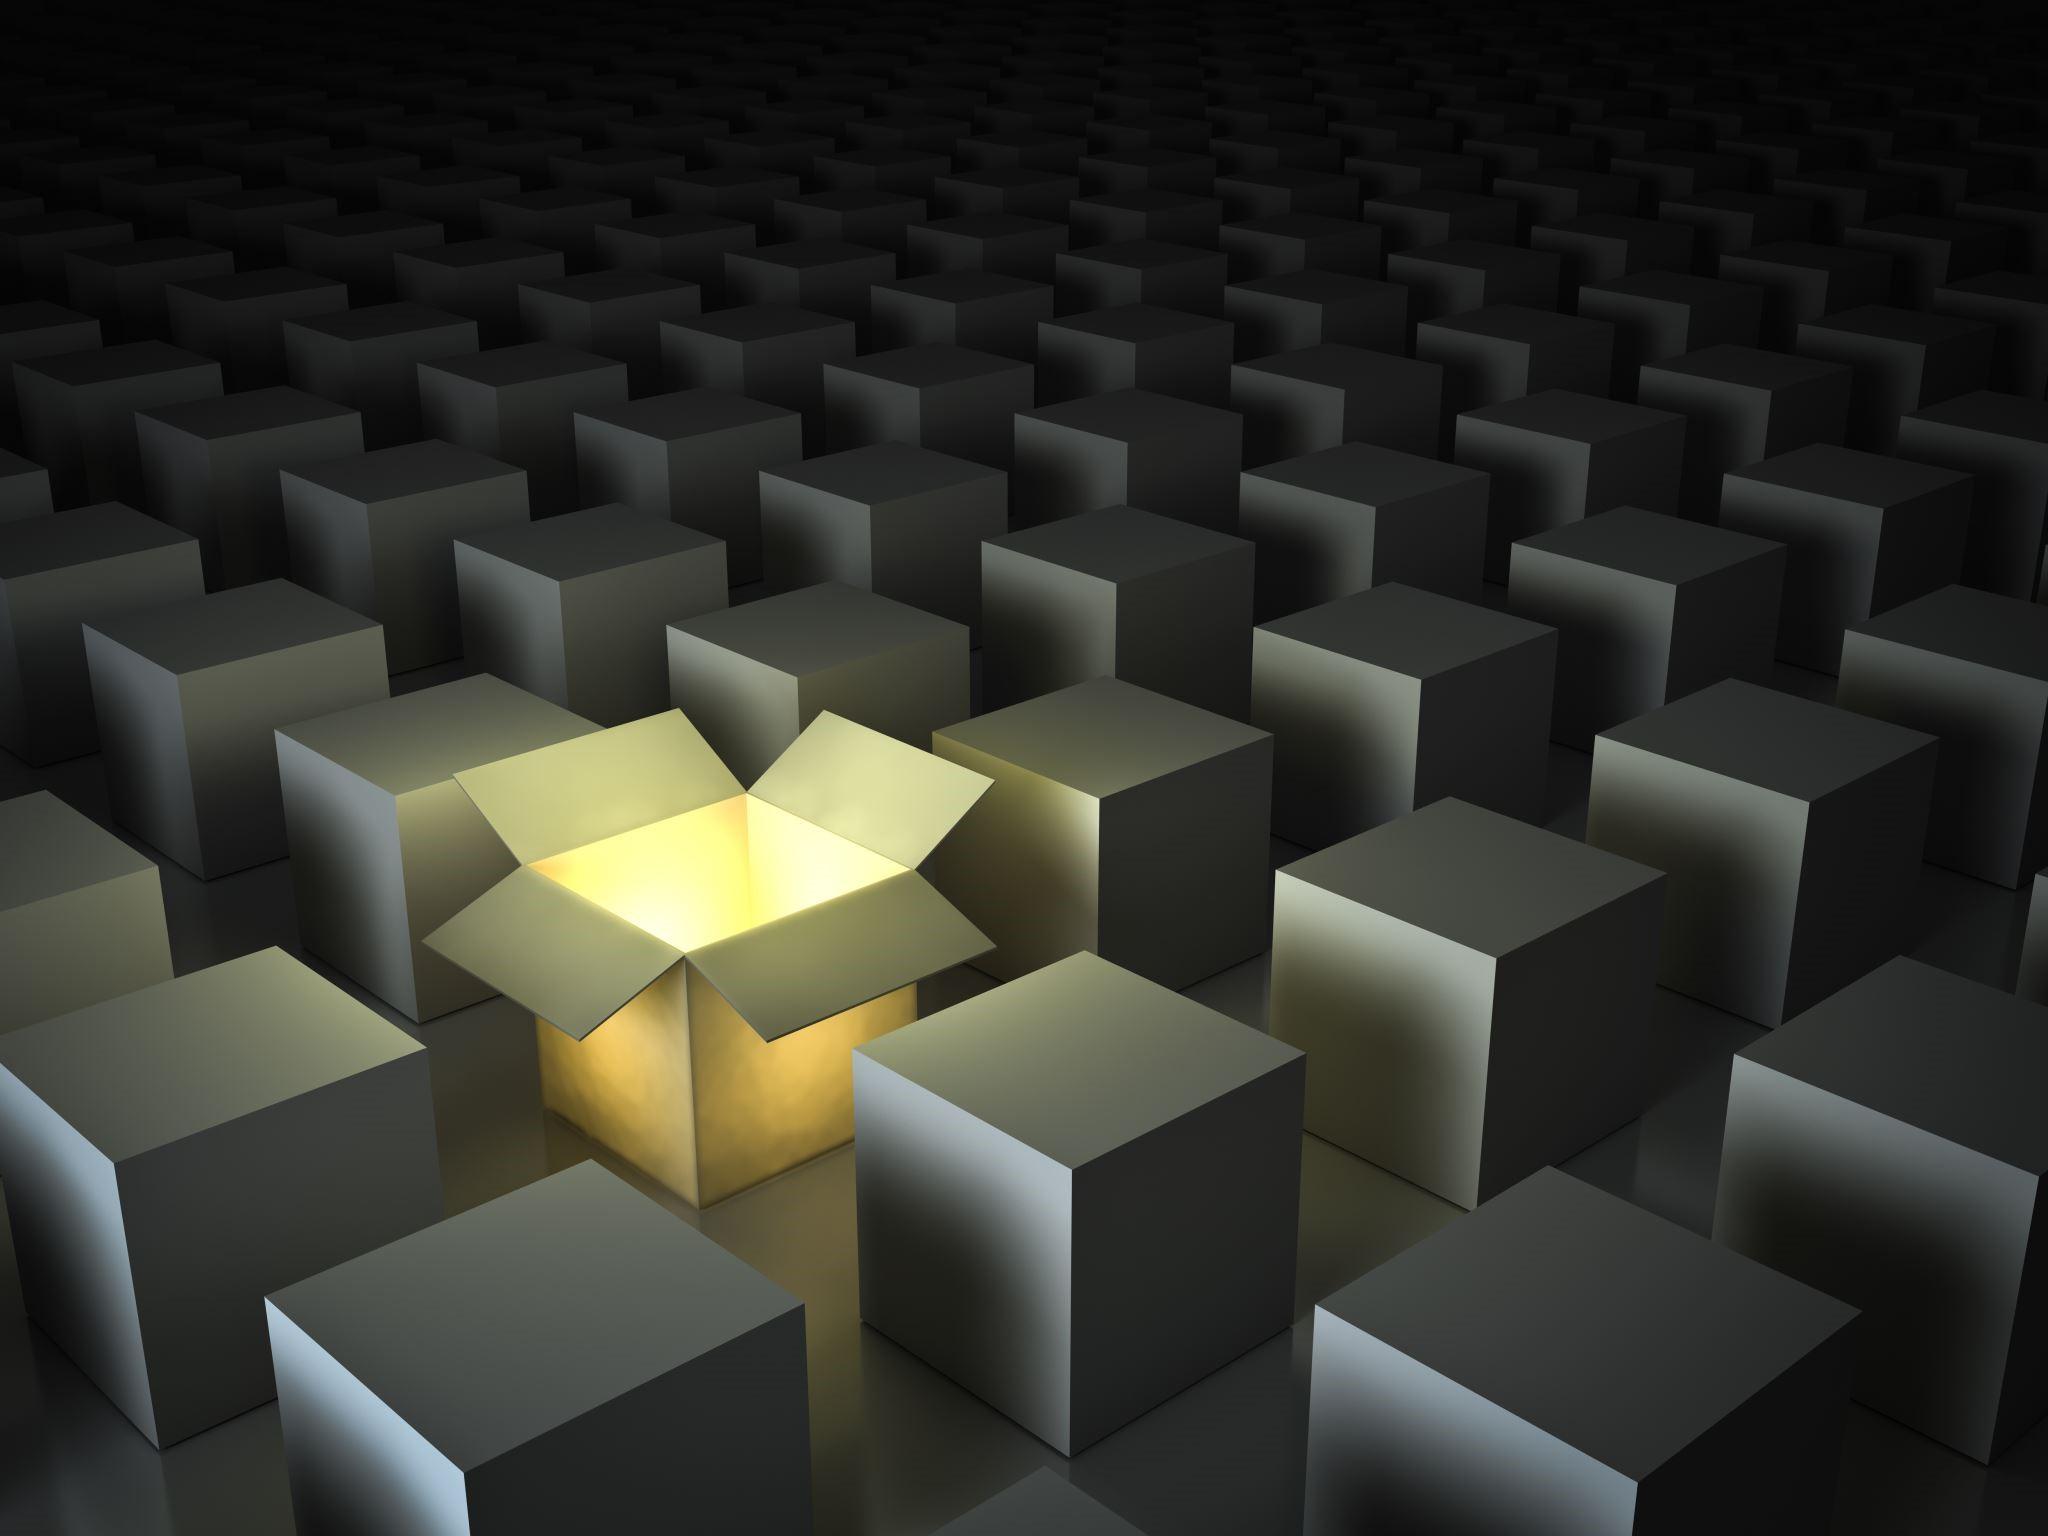 illuminated box